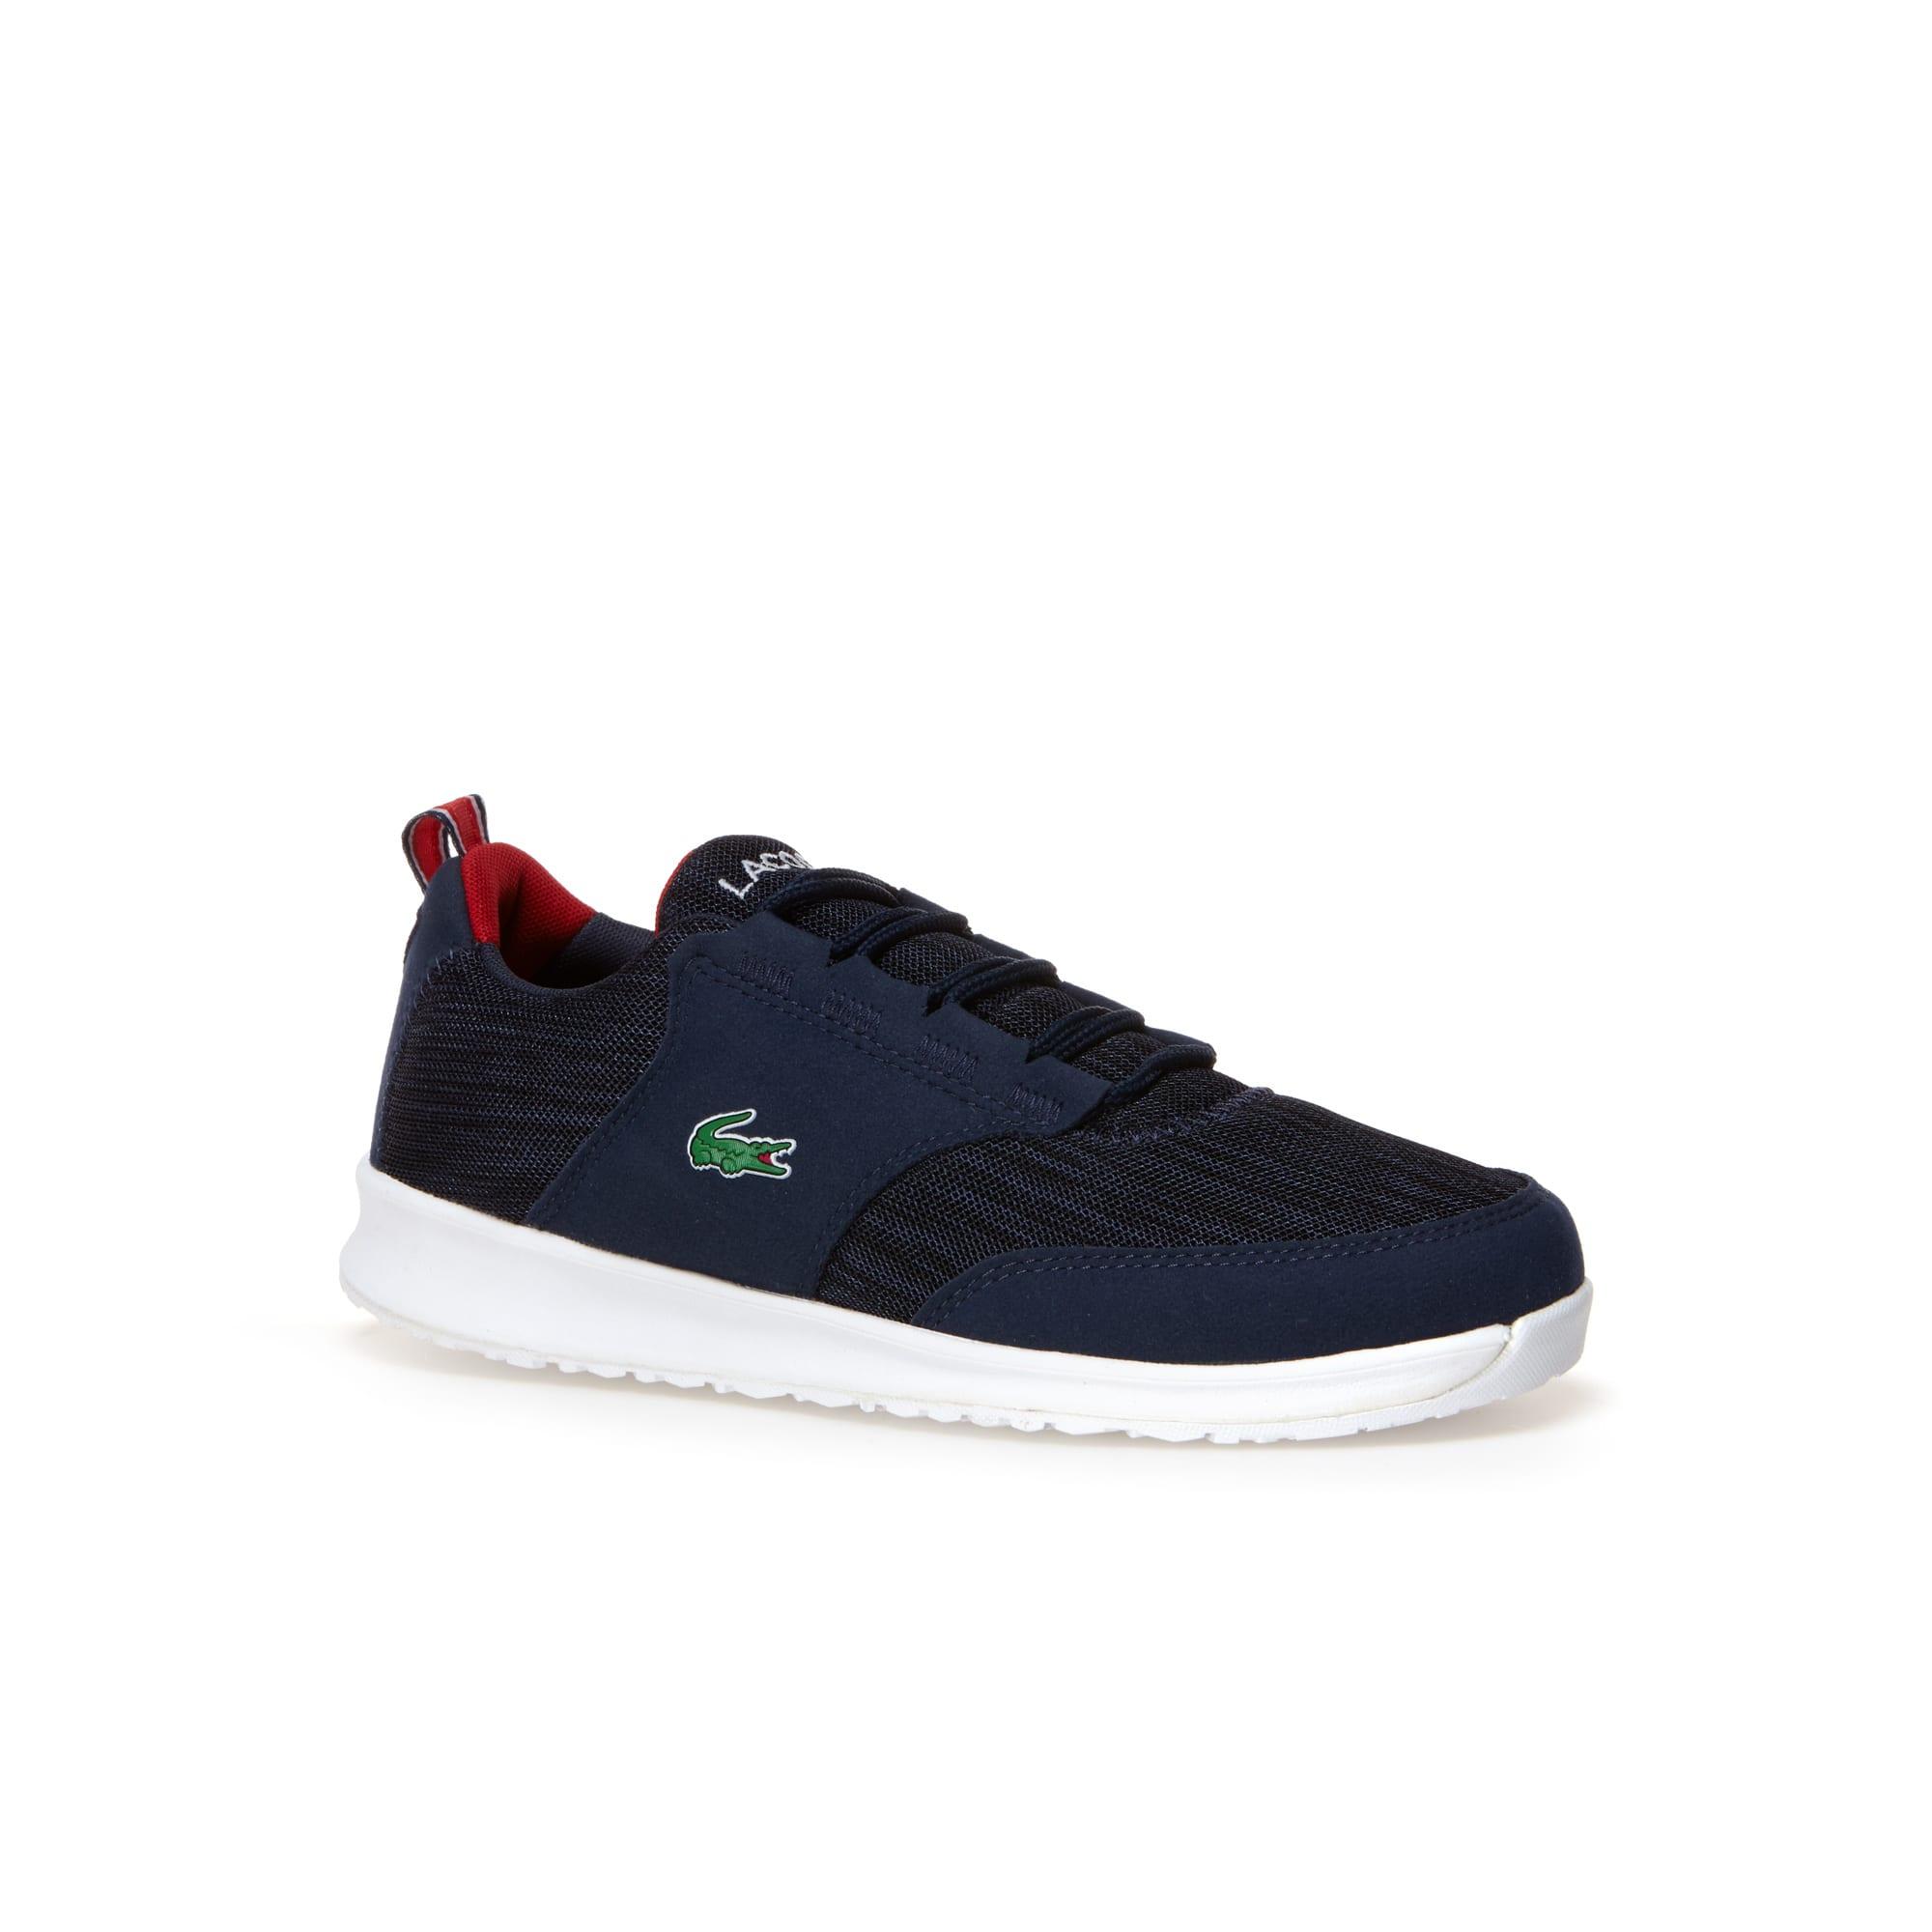 حذاء L.ight  رياضي نسيجي خفيف للأطفال